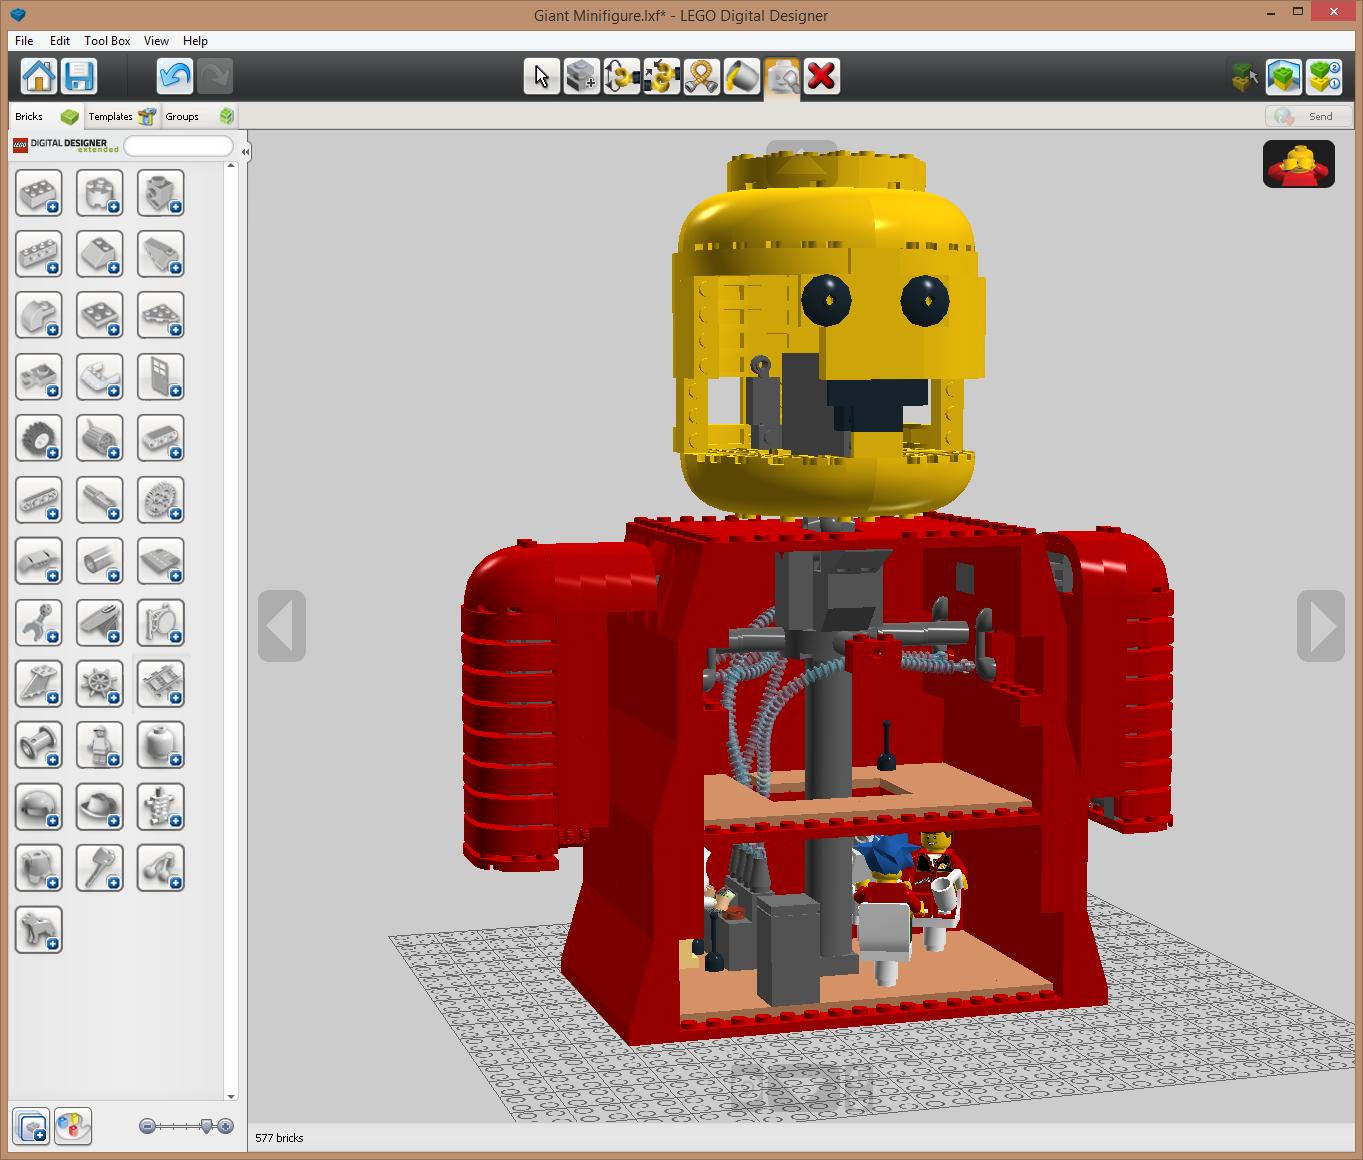 Image Giant Minifigure Lddg Lego Message Boards Wiki Fandom